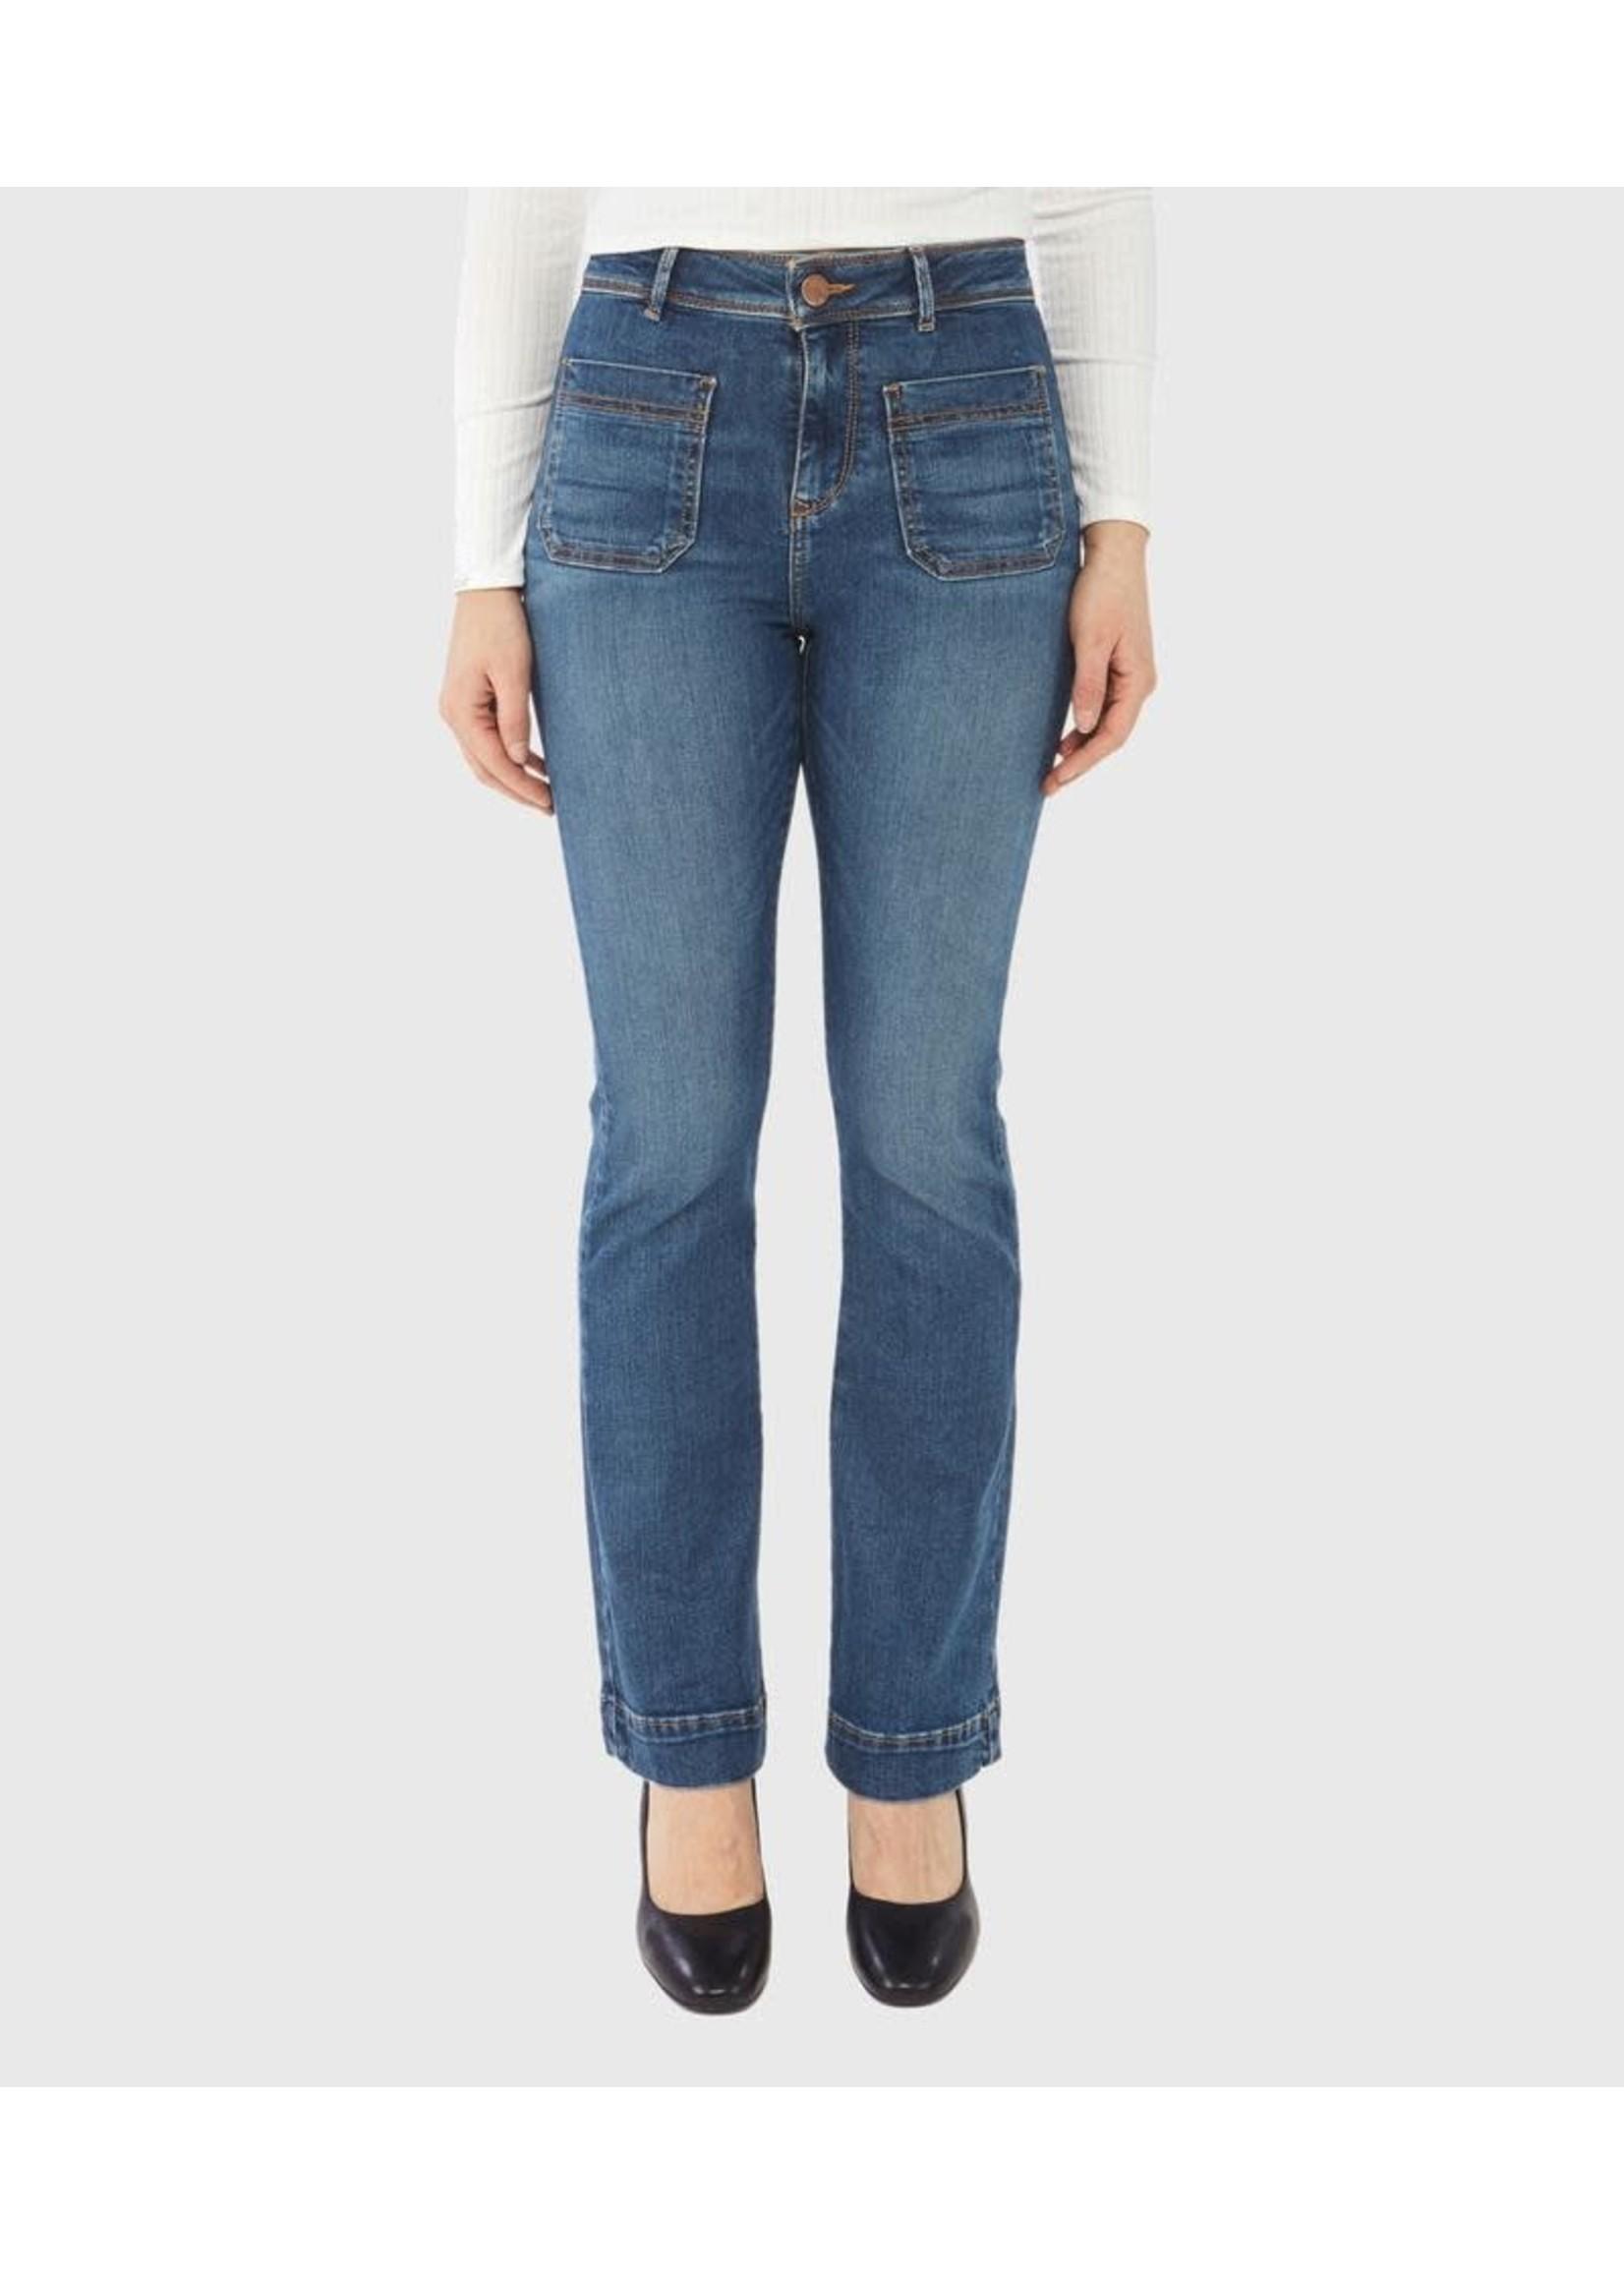 Lola Jeans Billie Jean